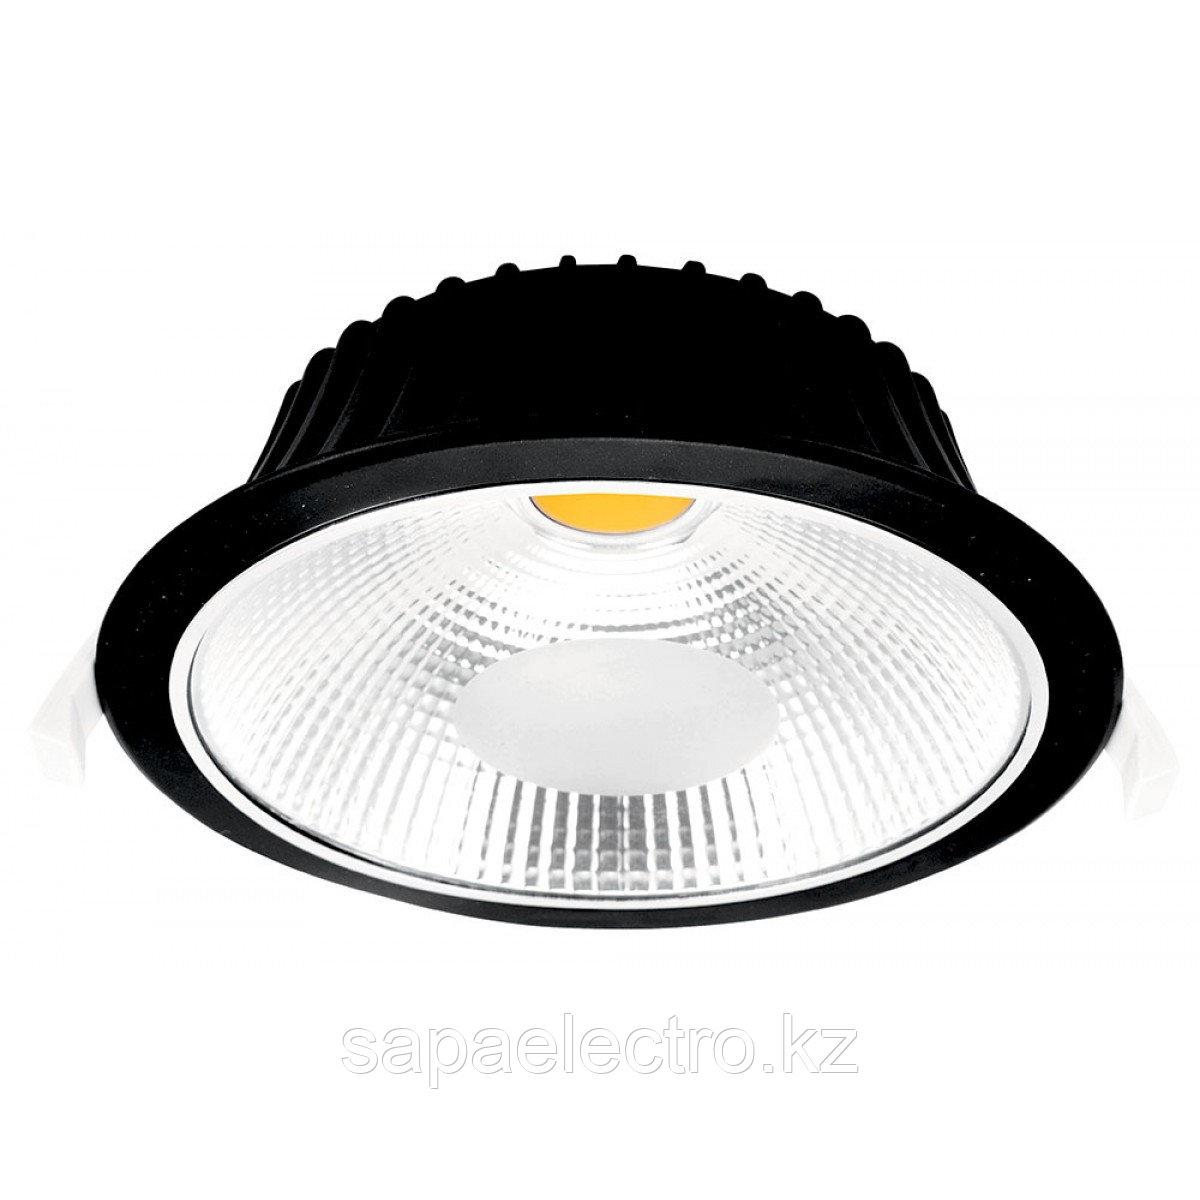 Свет-к DOWNLIGHT LED VESTACOB10W BLACK 5000K(TS)50